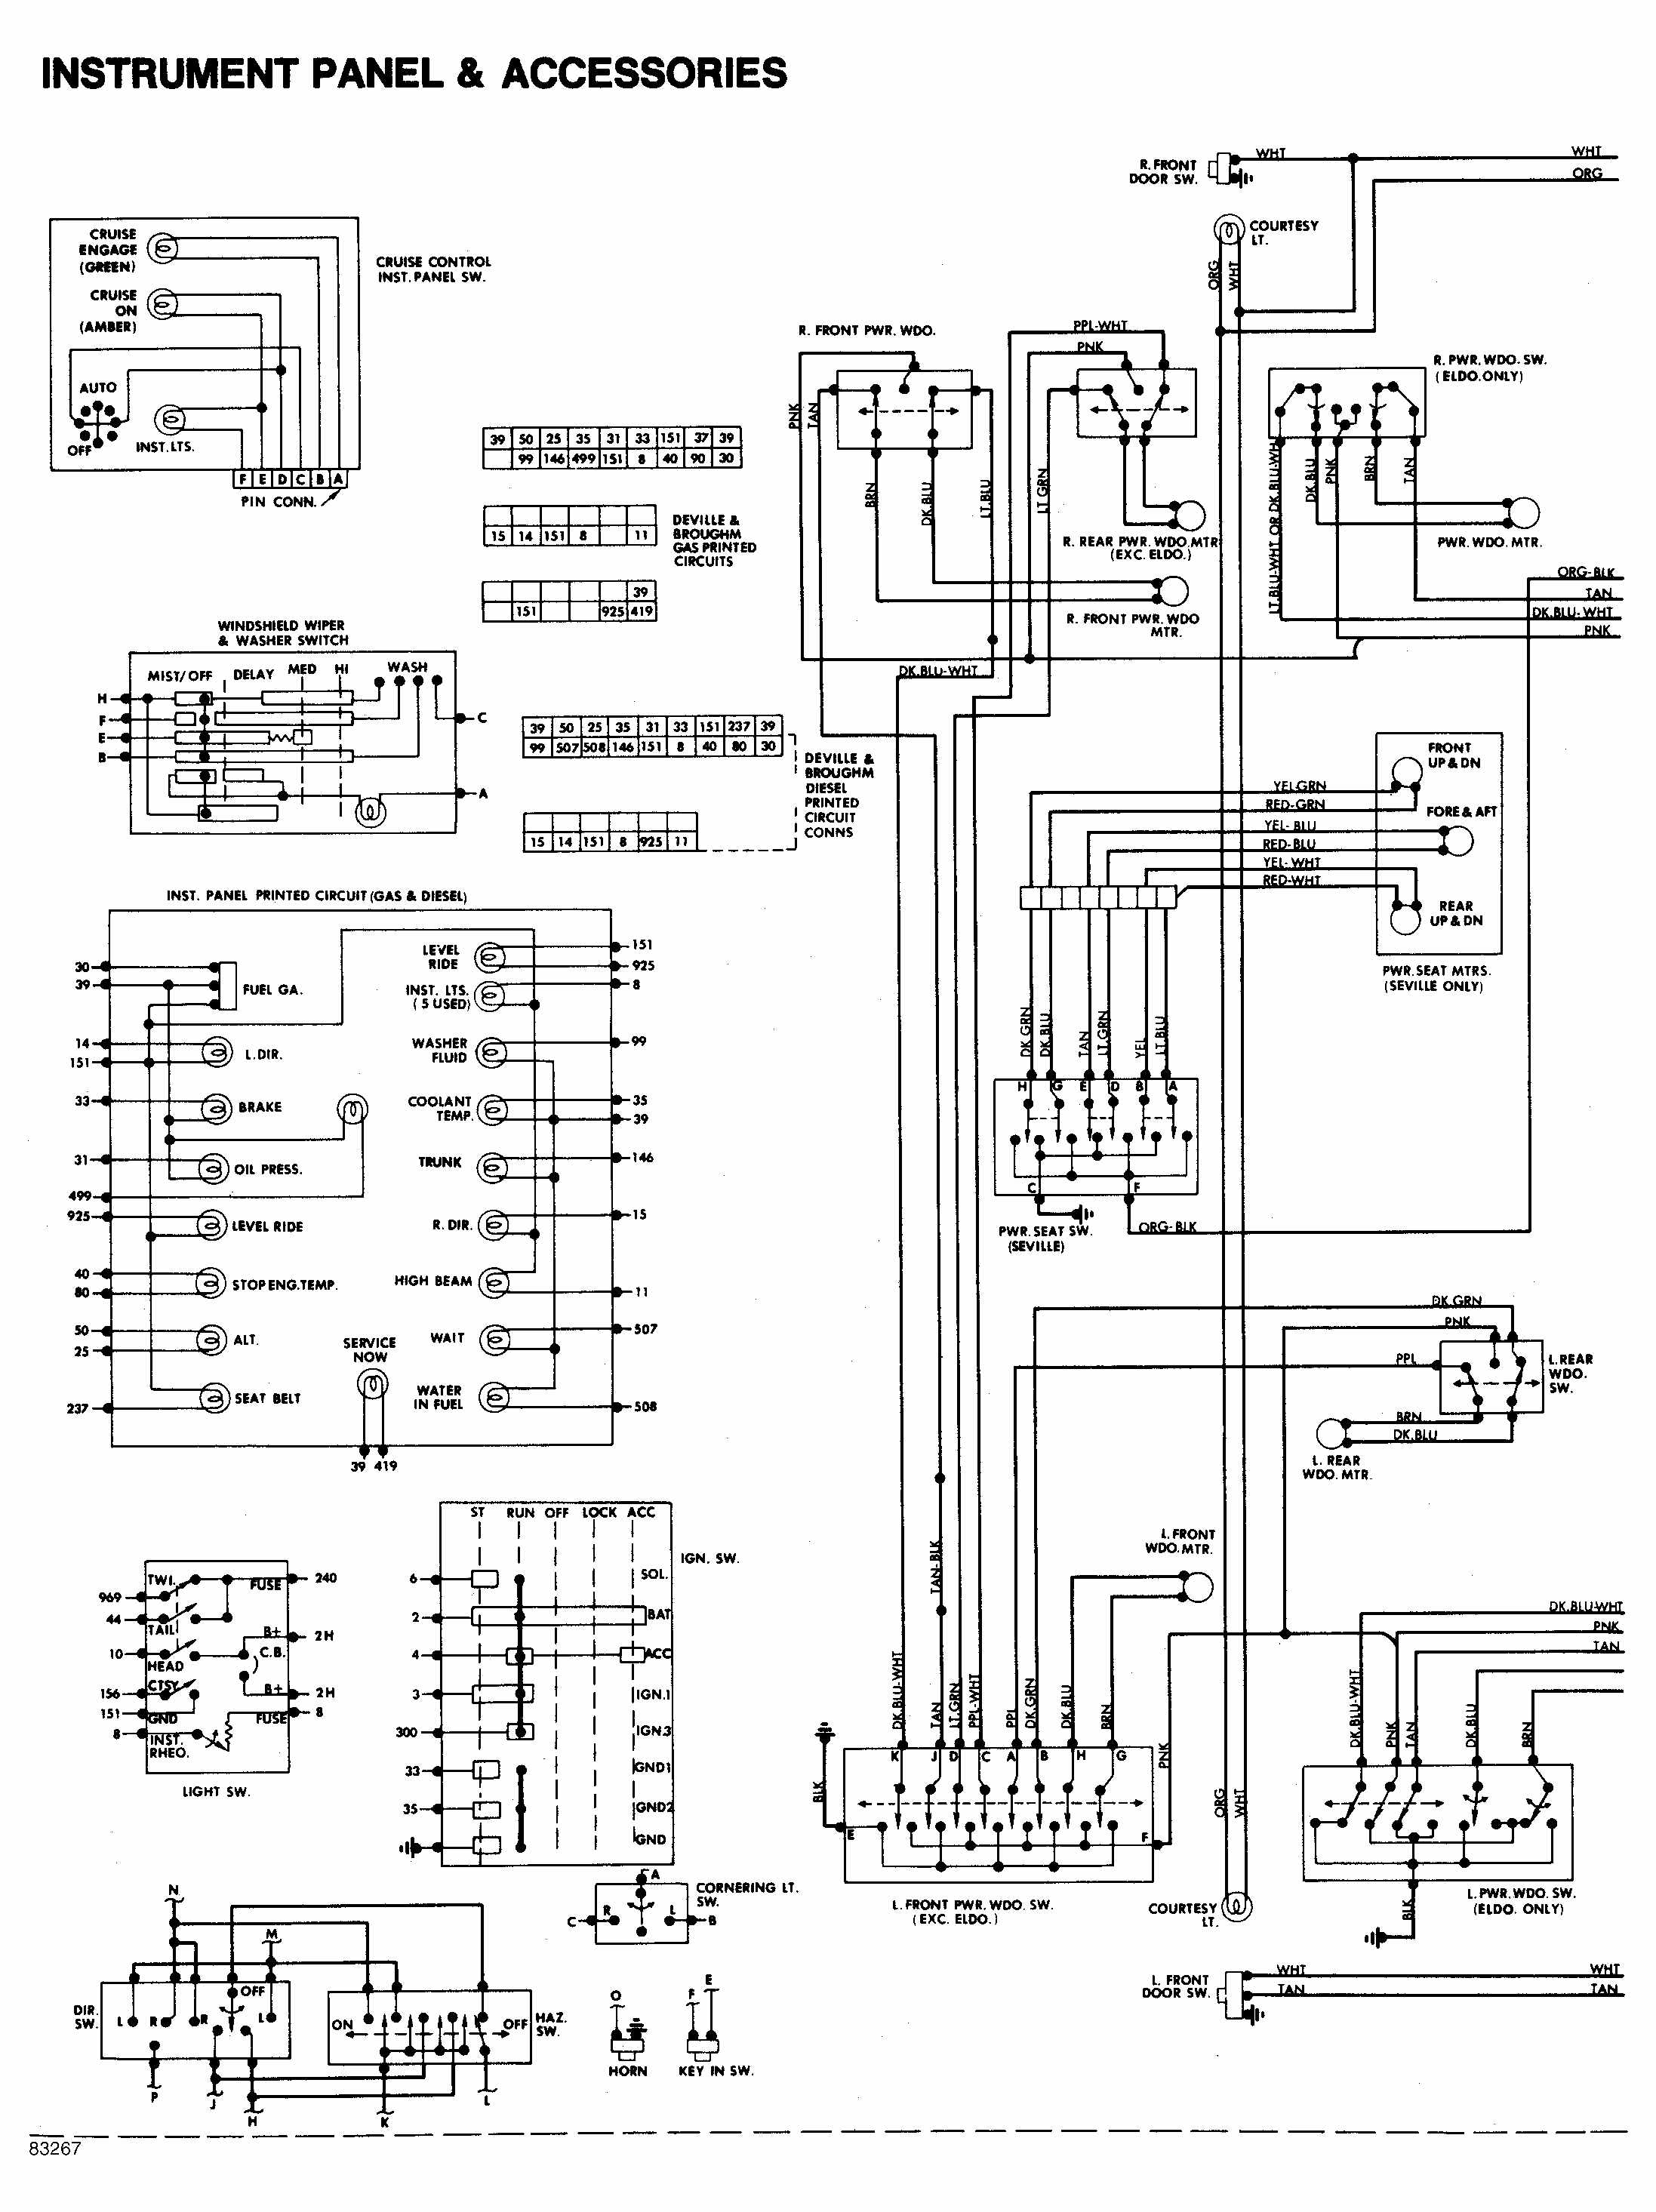 cadillac seville starter wiring schematic diagramcadillac deville starter wiring wiring diagram 1978 cadillac seville motor starter wiring diagram 1994 deville all